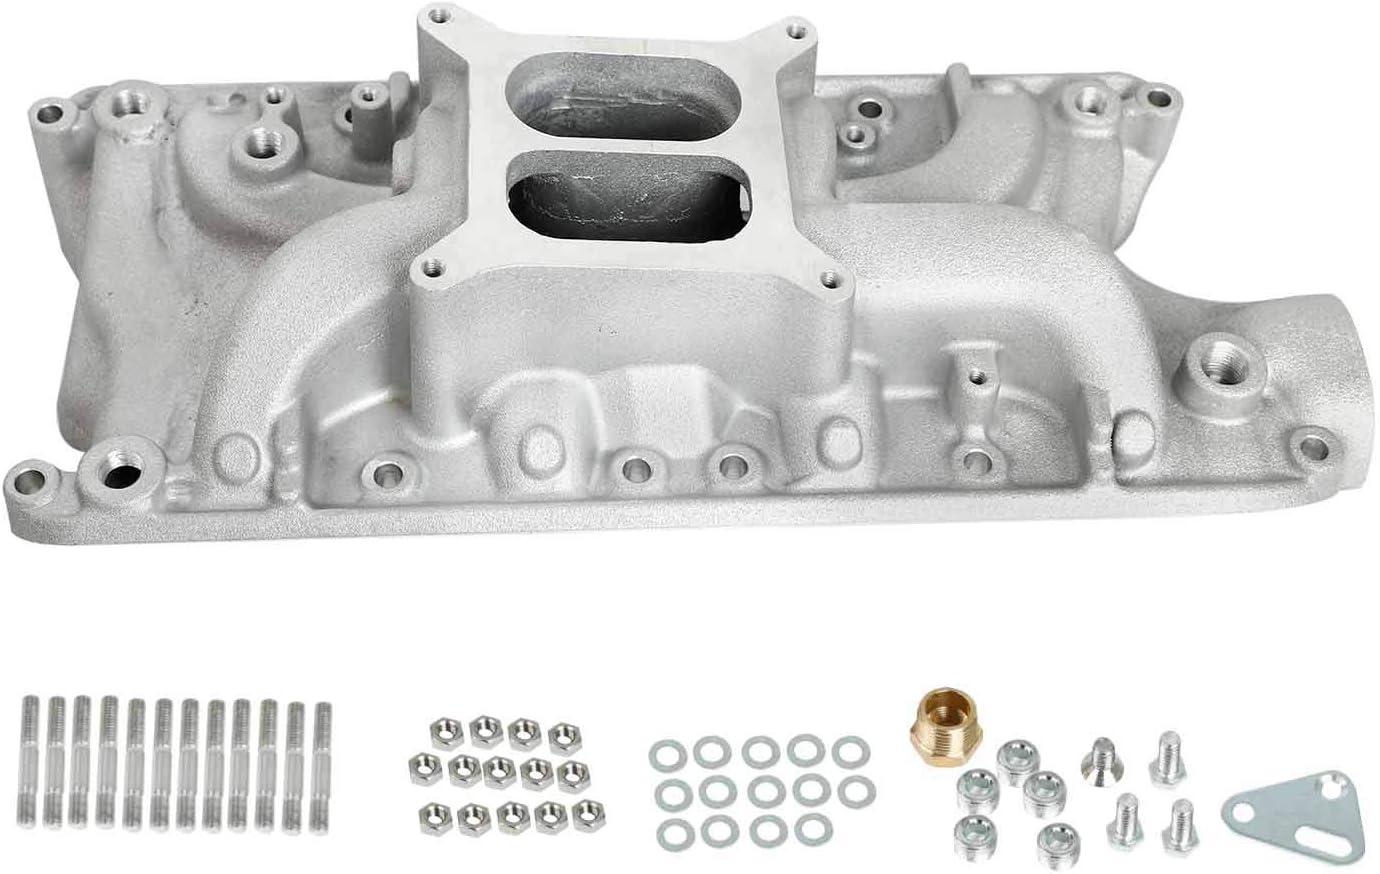 TYFYB Aluminum Superior Air Gap Intake Manifold 1 year warranty 260 For SBF 28 Plane Dual